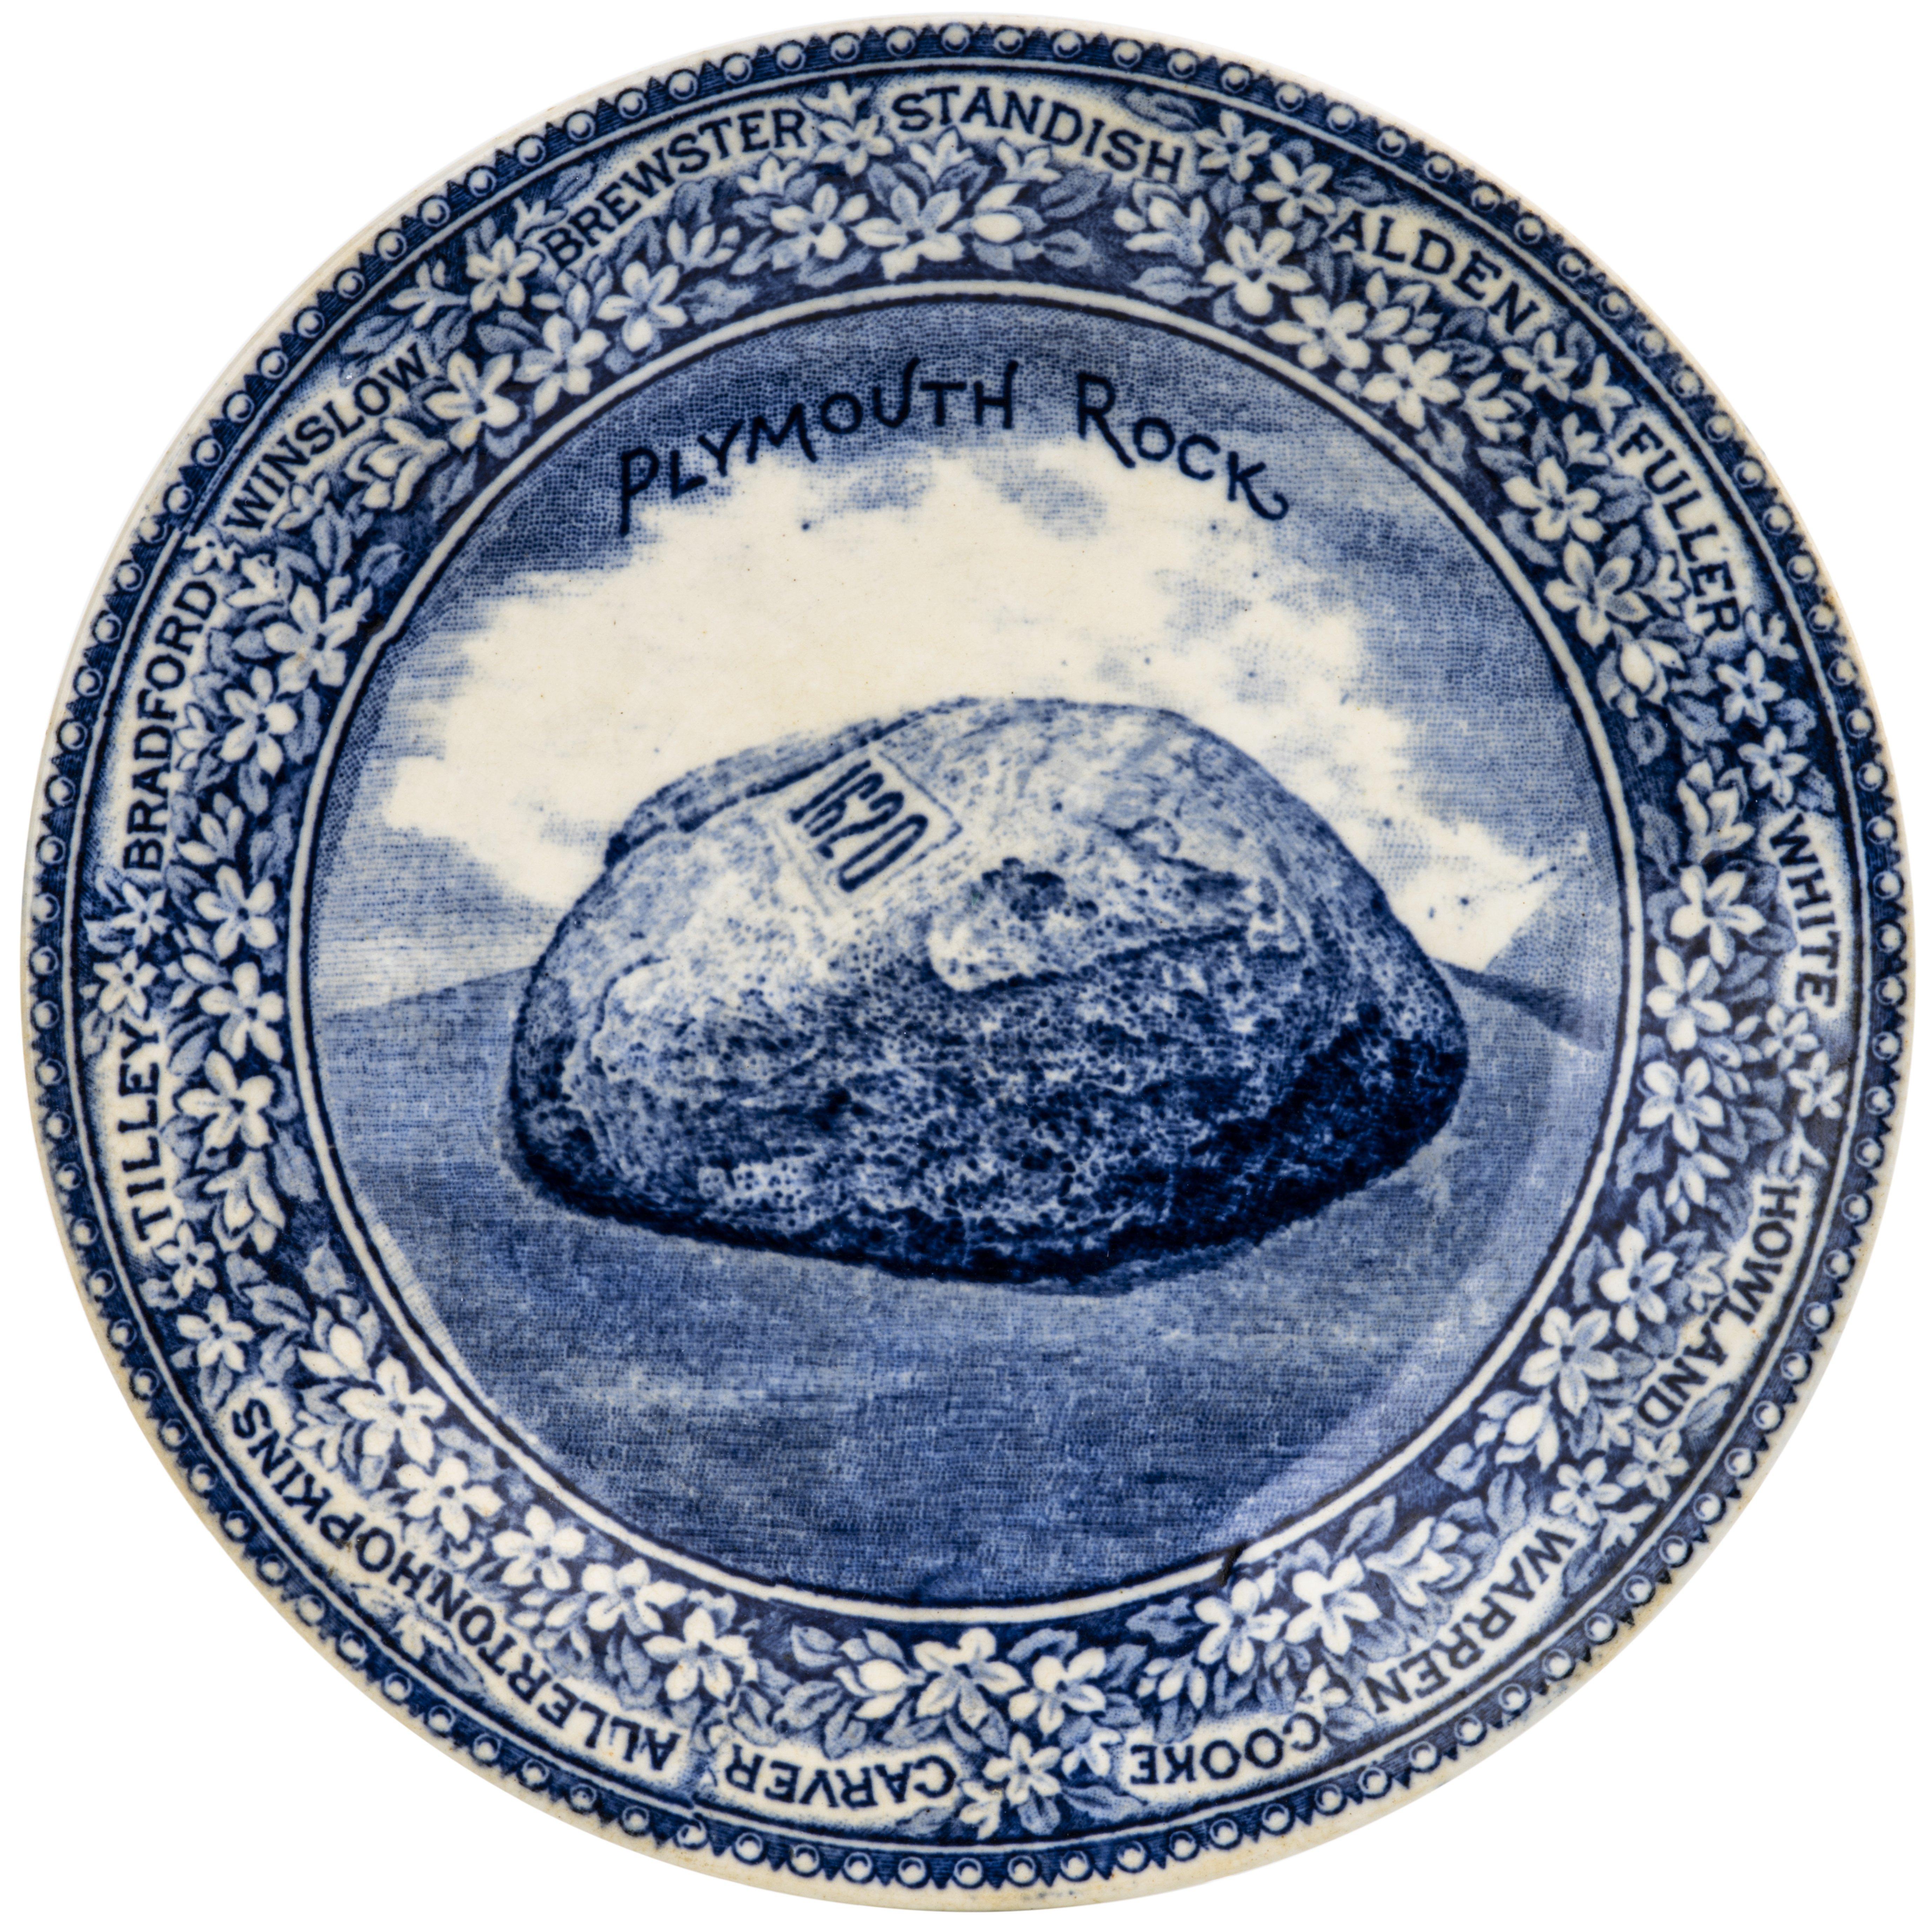 A Plymouth Rock 1620 British Anchor A.S. Burbank Historic Transfer Printed Dish